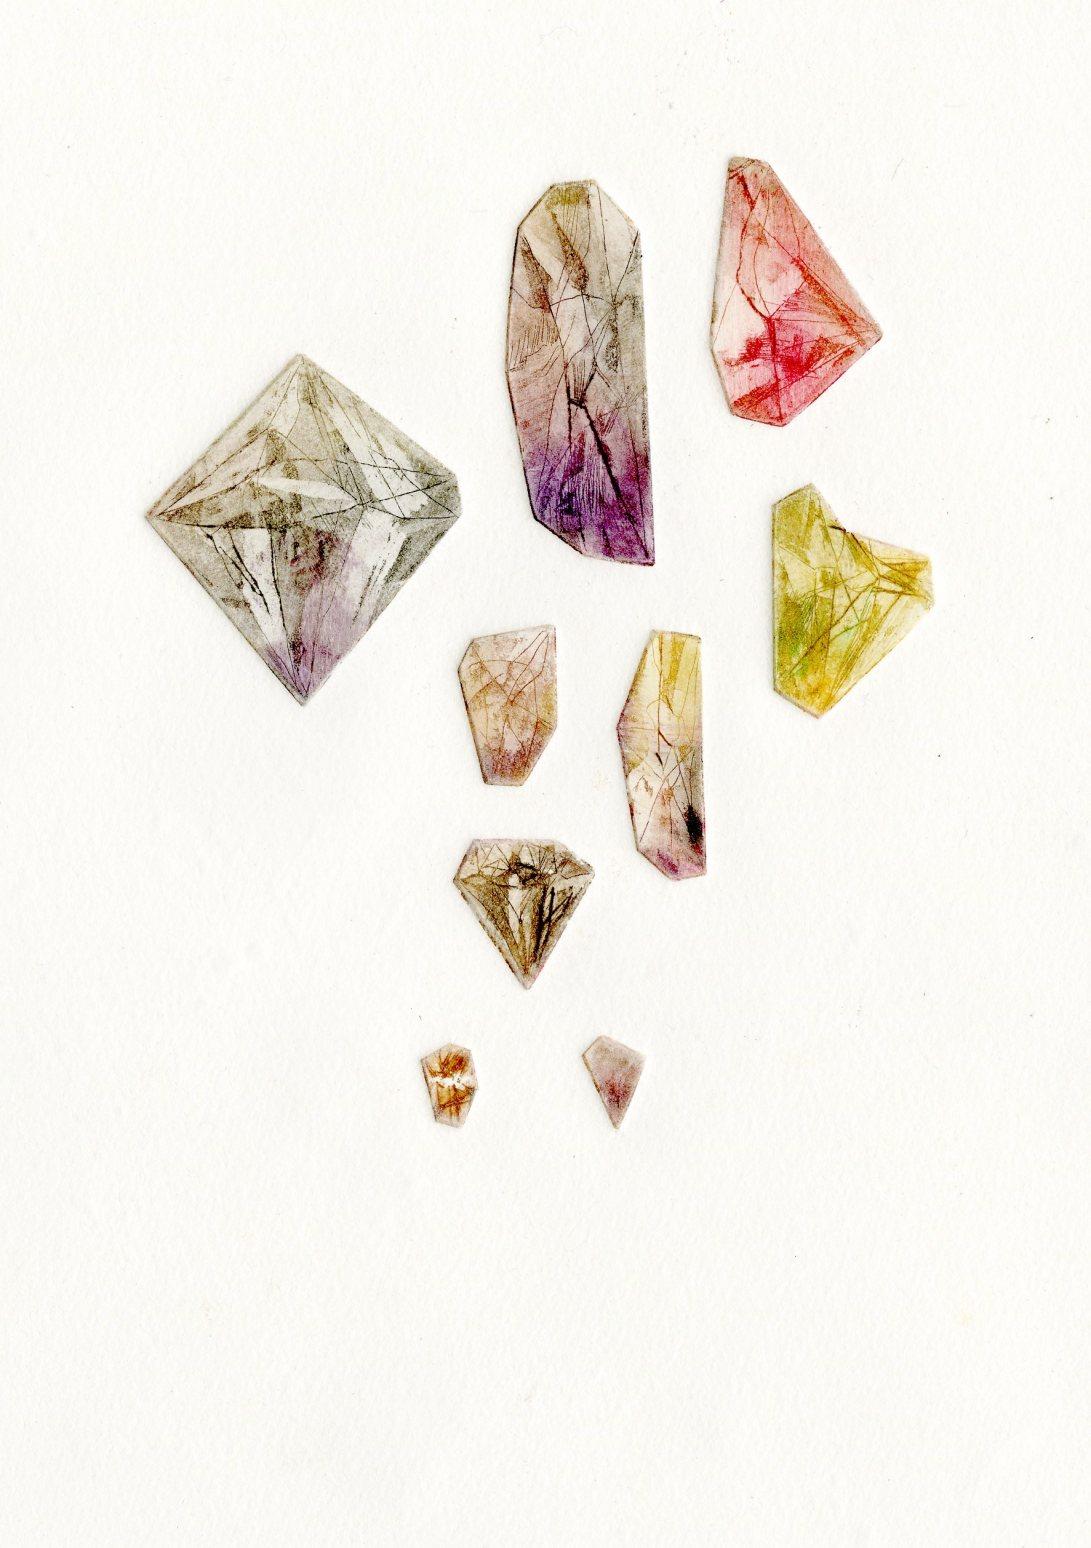 Copper Gems- All